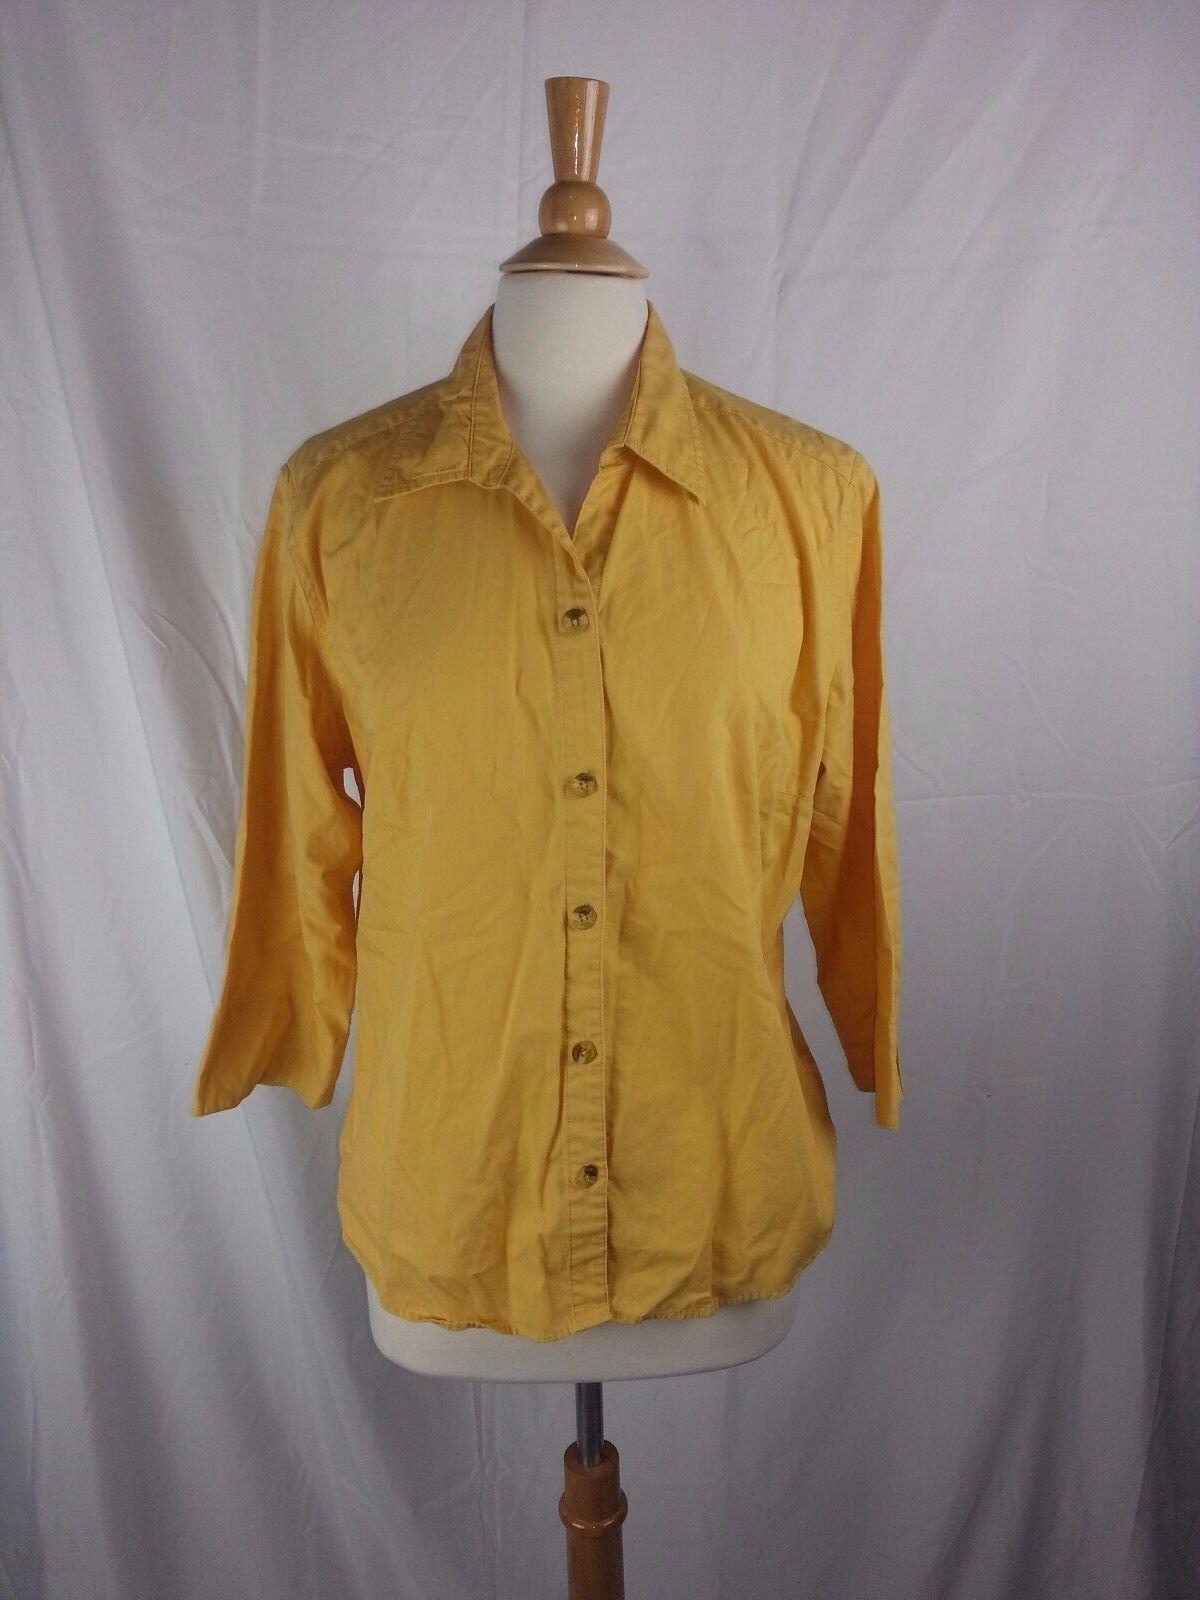 Women's Columbia Sportswear 3 4 Sleeve Button Front Yellow Shirt Top Size XL